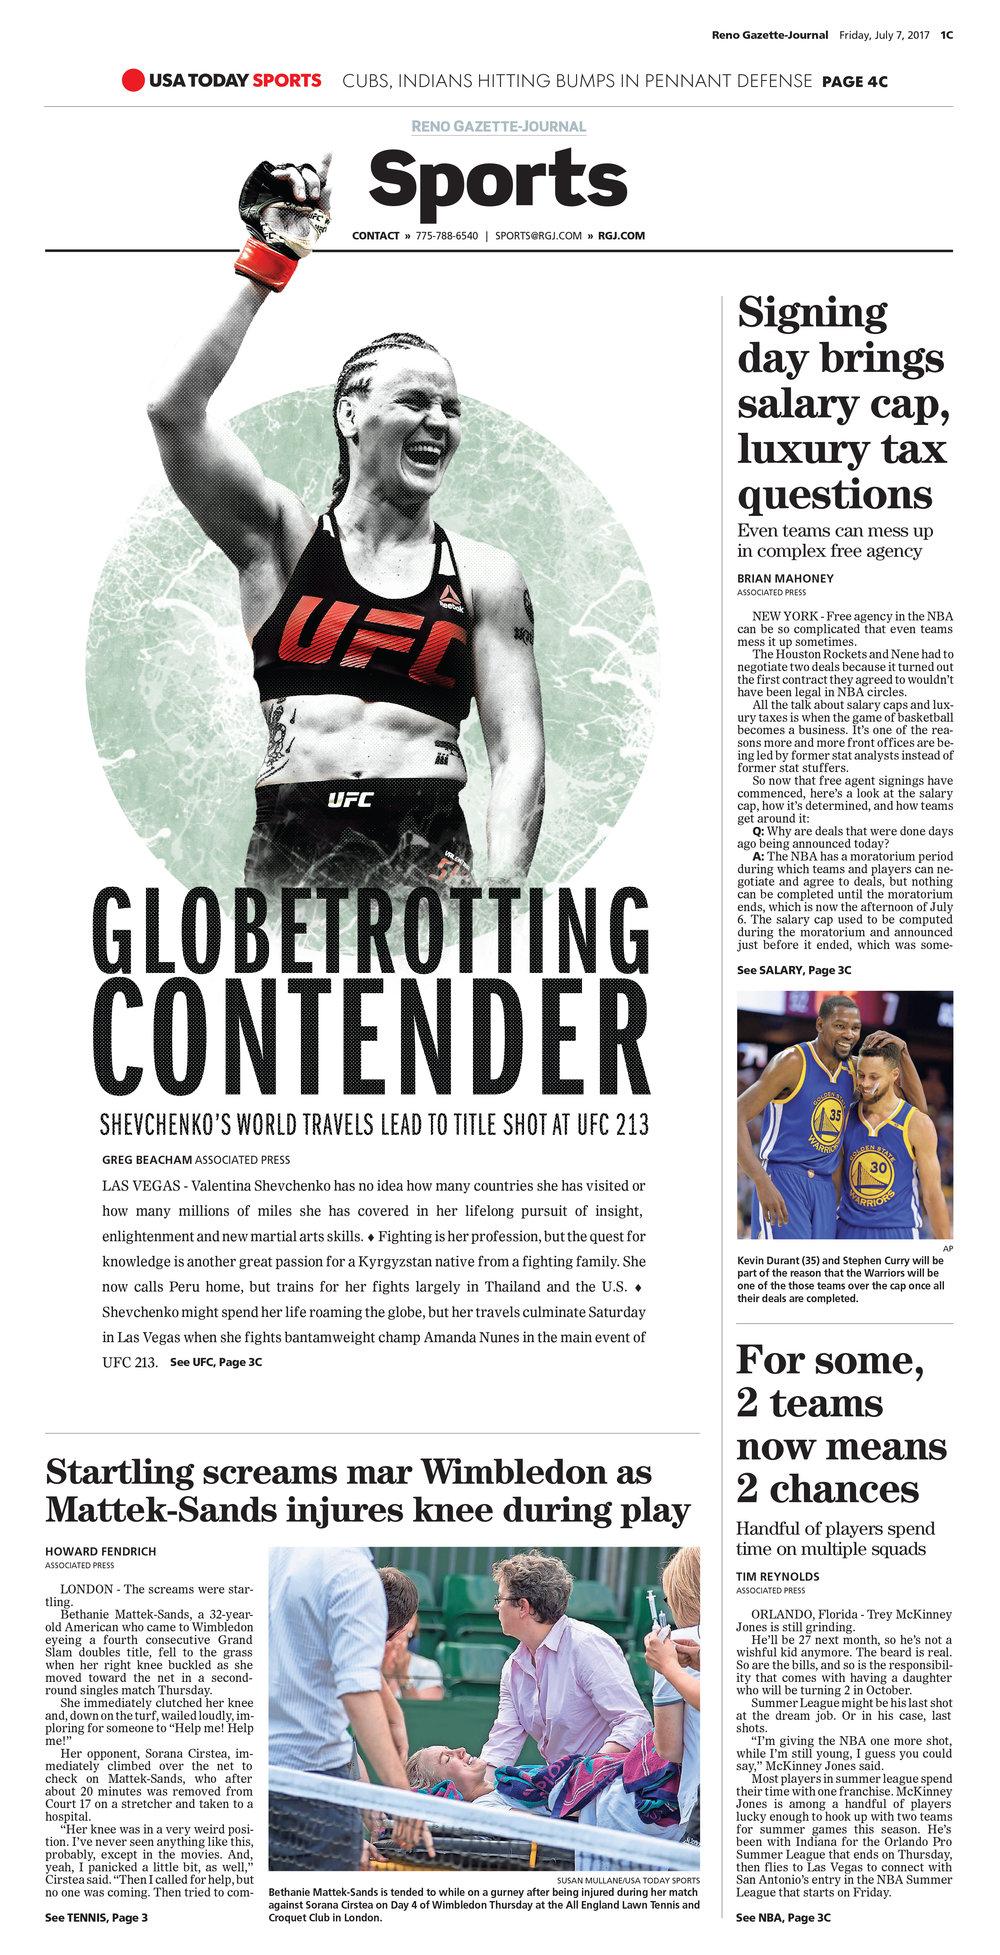 Sports-Cov, RENBrd2 07-07-2017, RGJ 1 - Sports.jpg